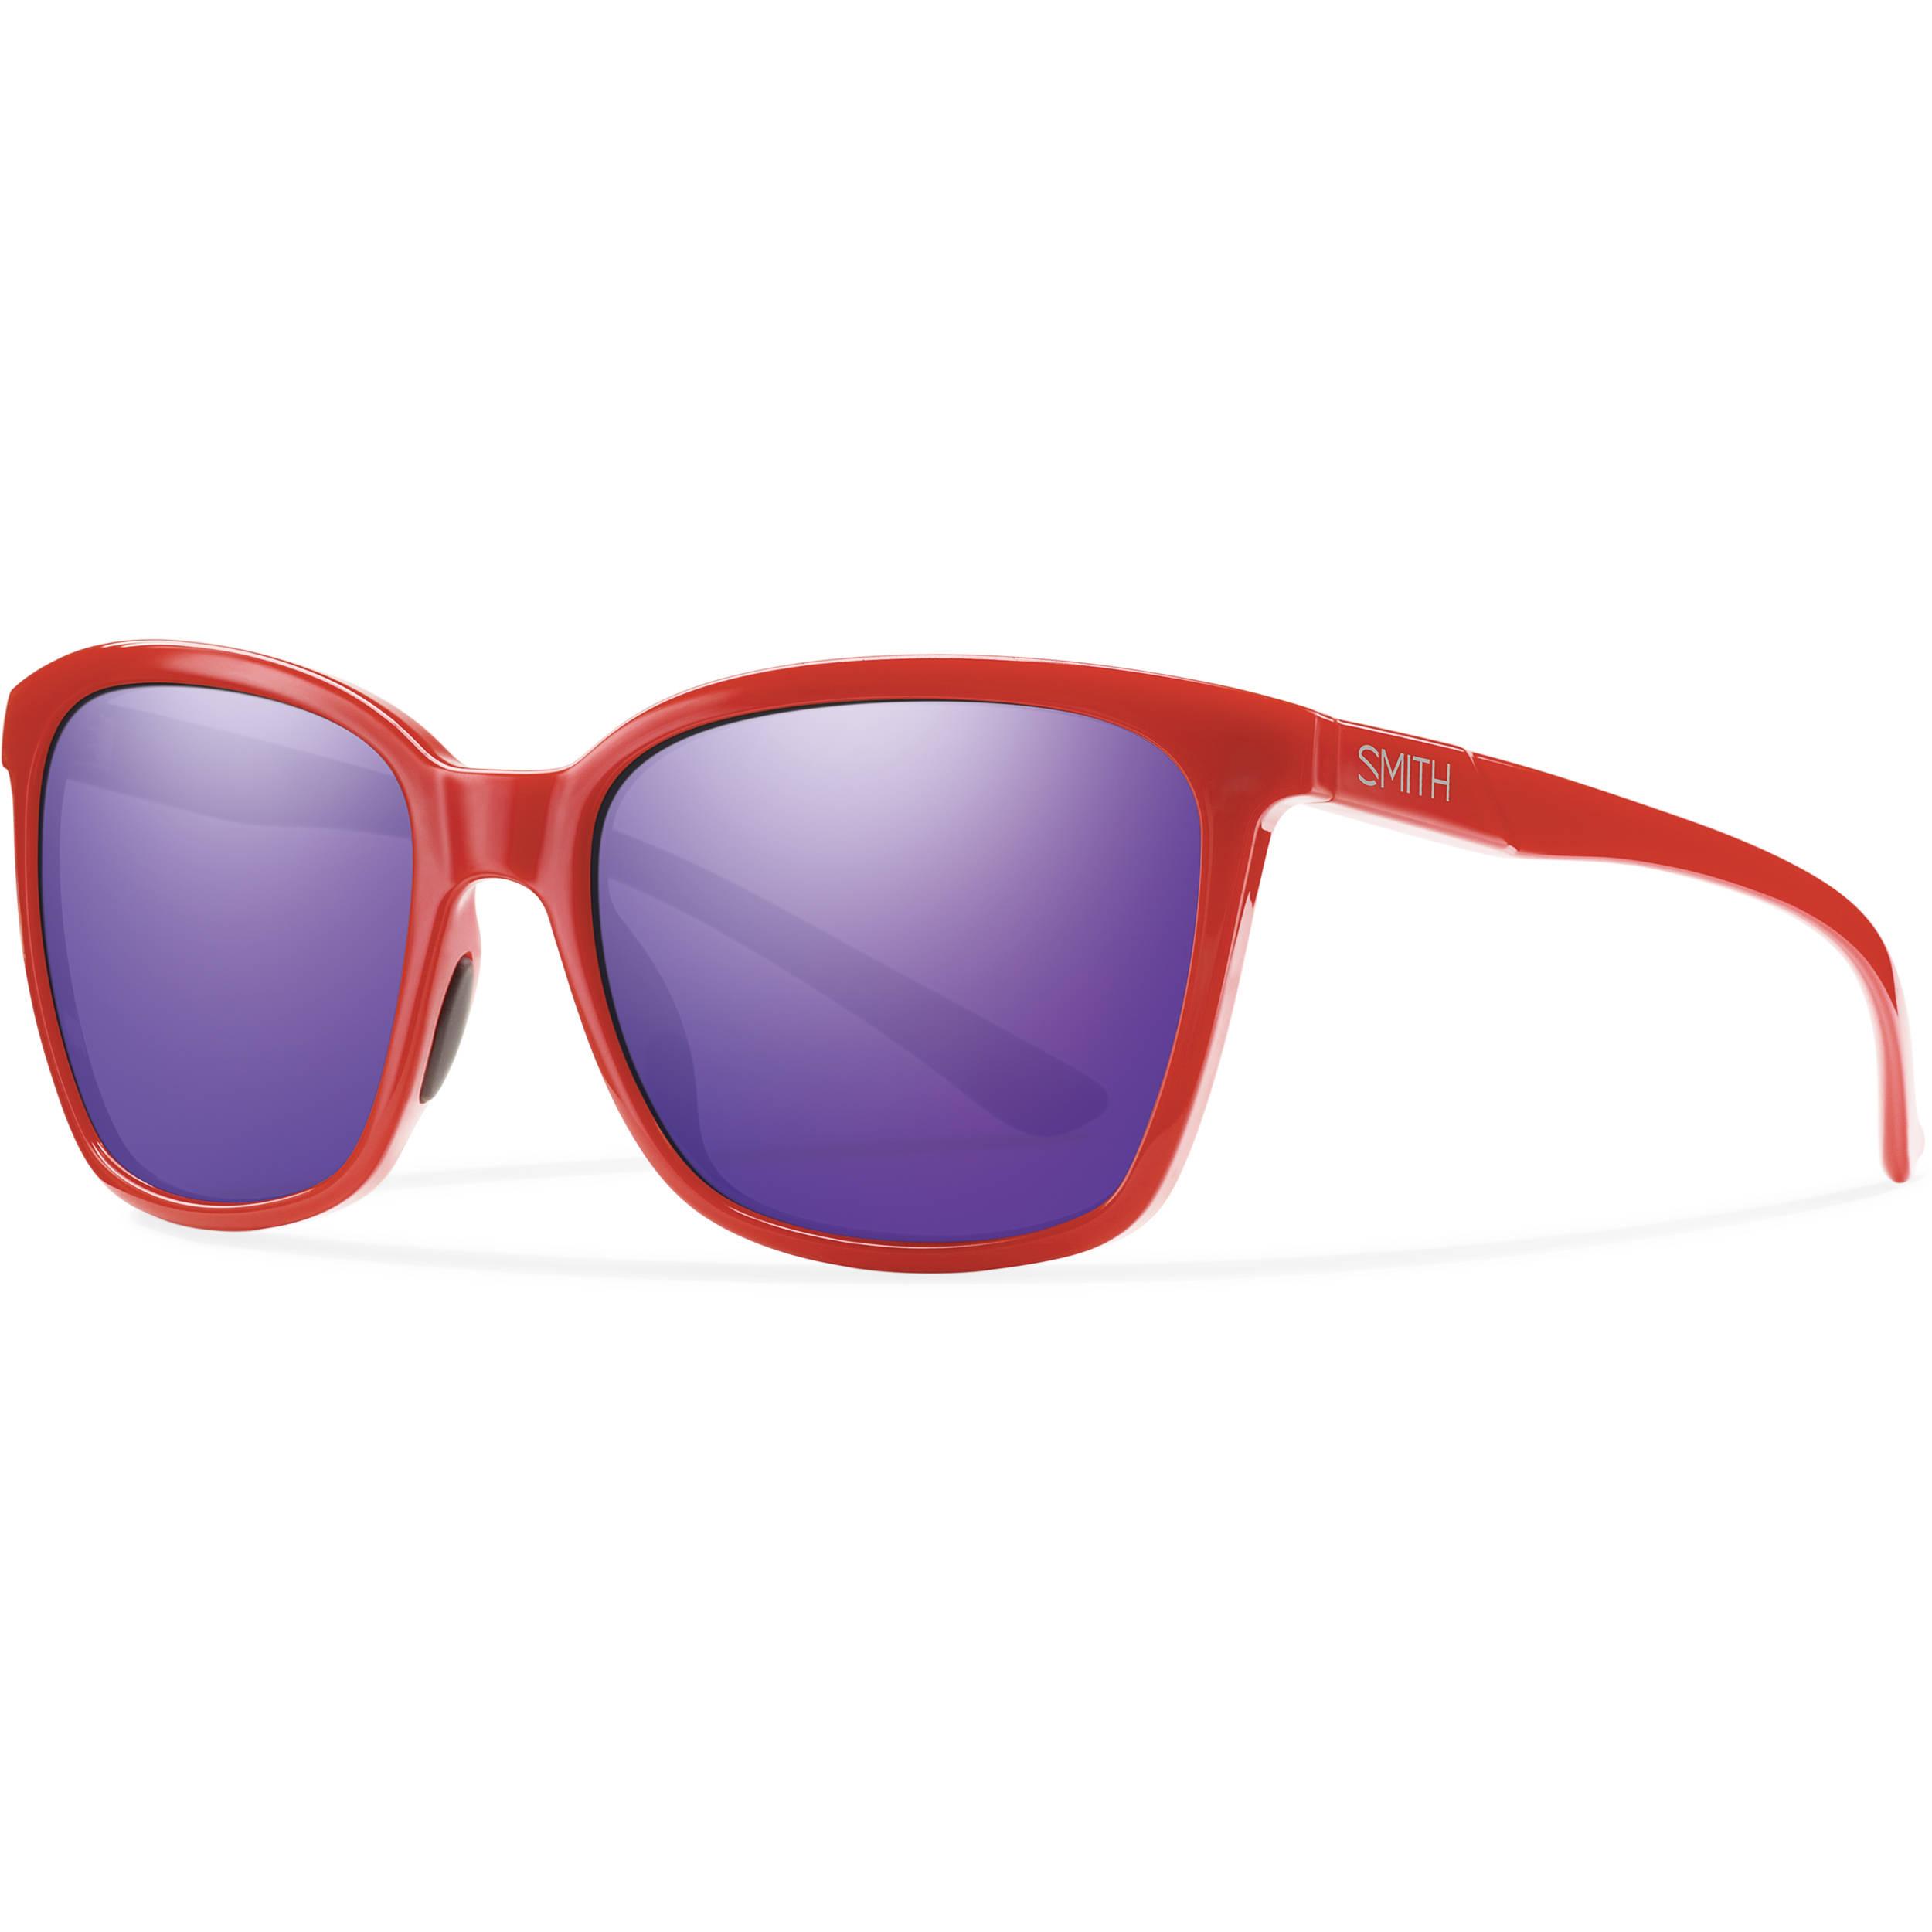 a89f2cbc6d Smith Optics Colette Sunglasses CLPCPRMRD B H Photo Video